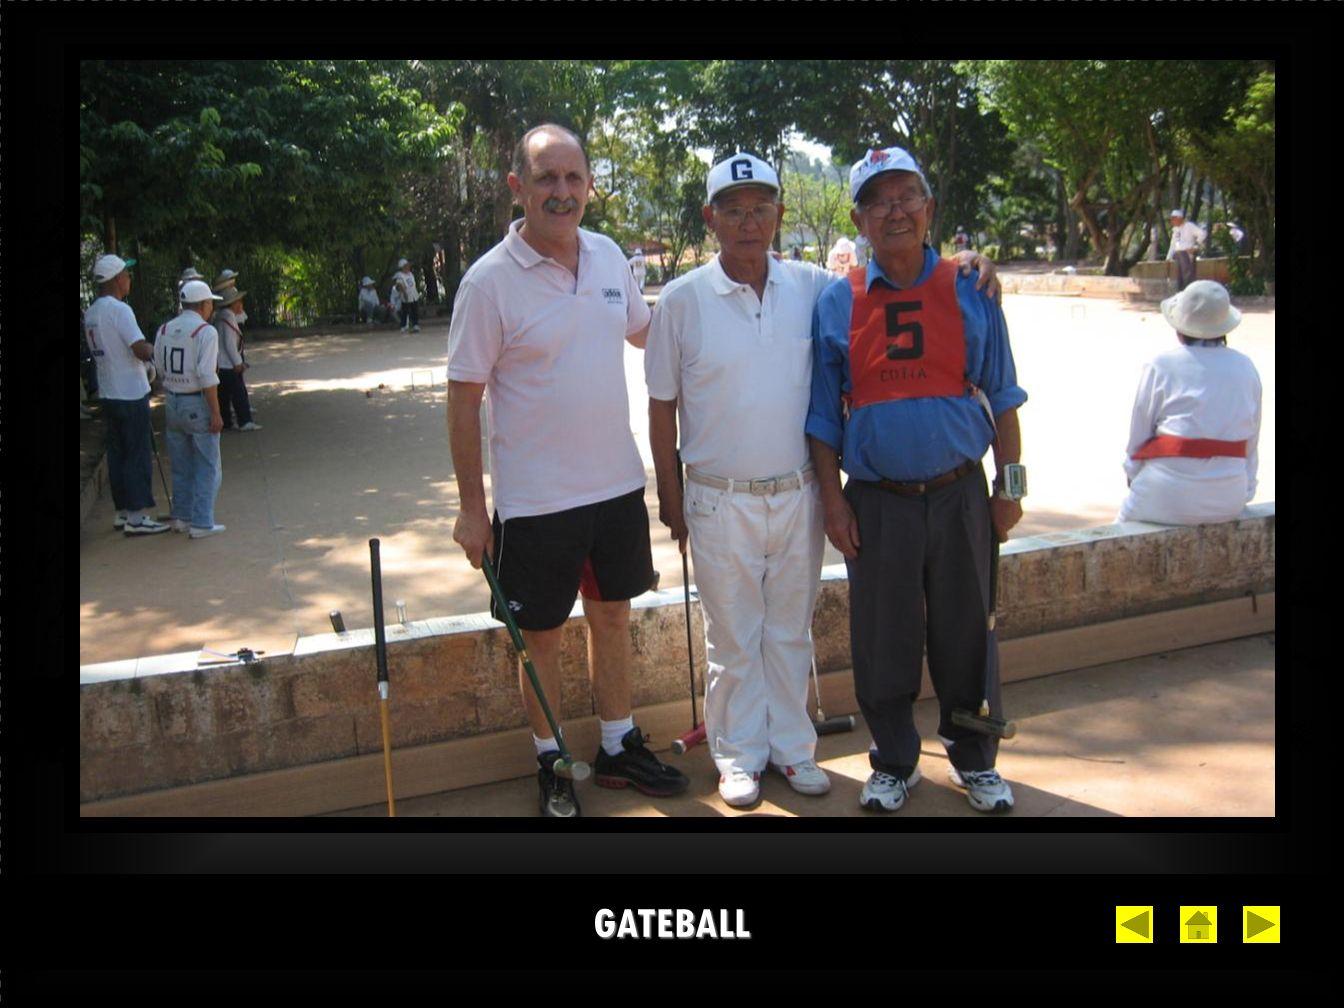 GATEBALL